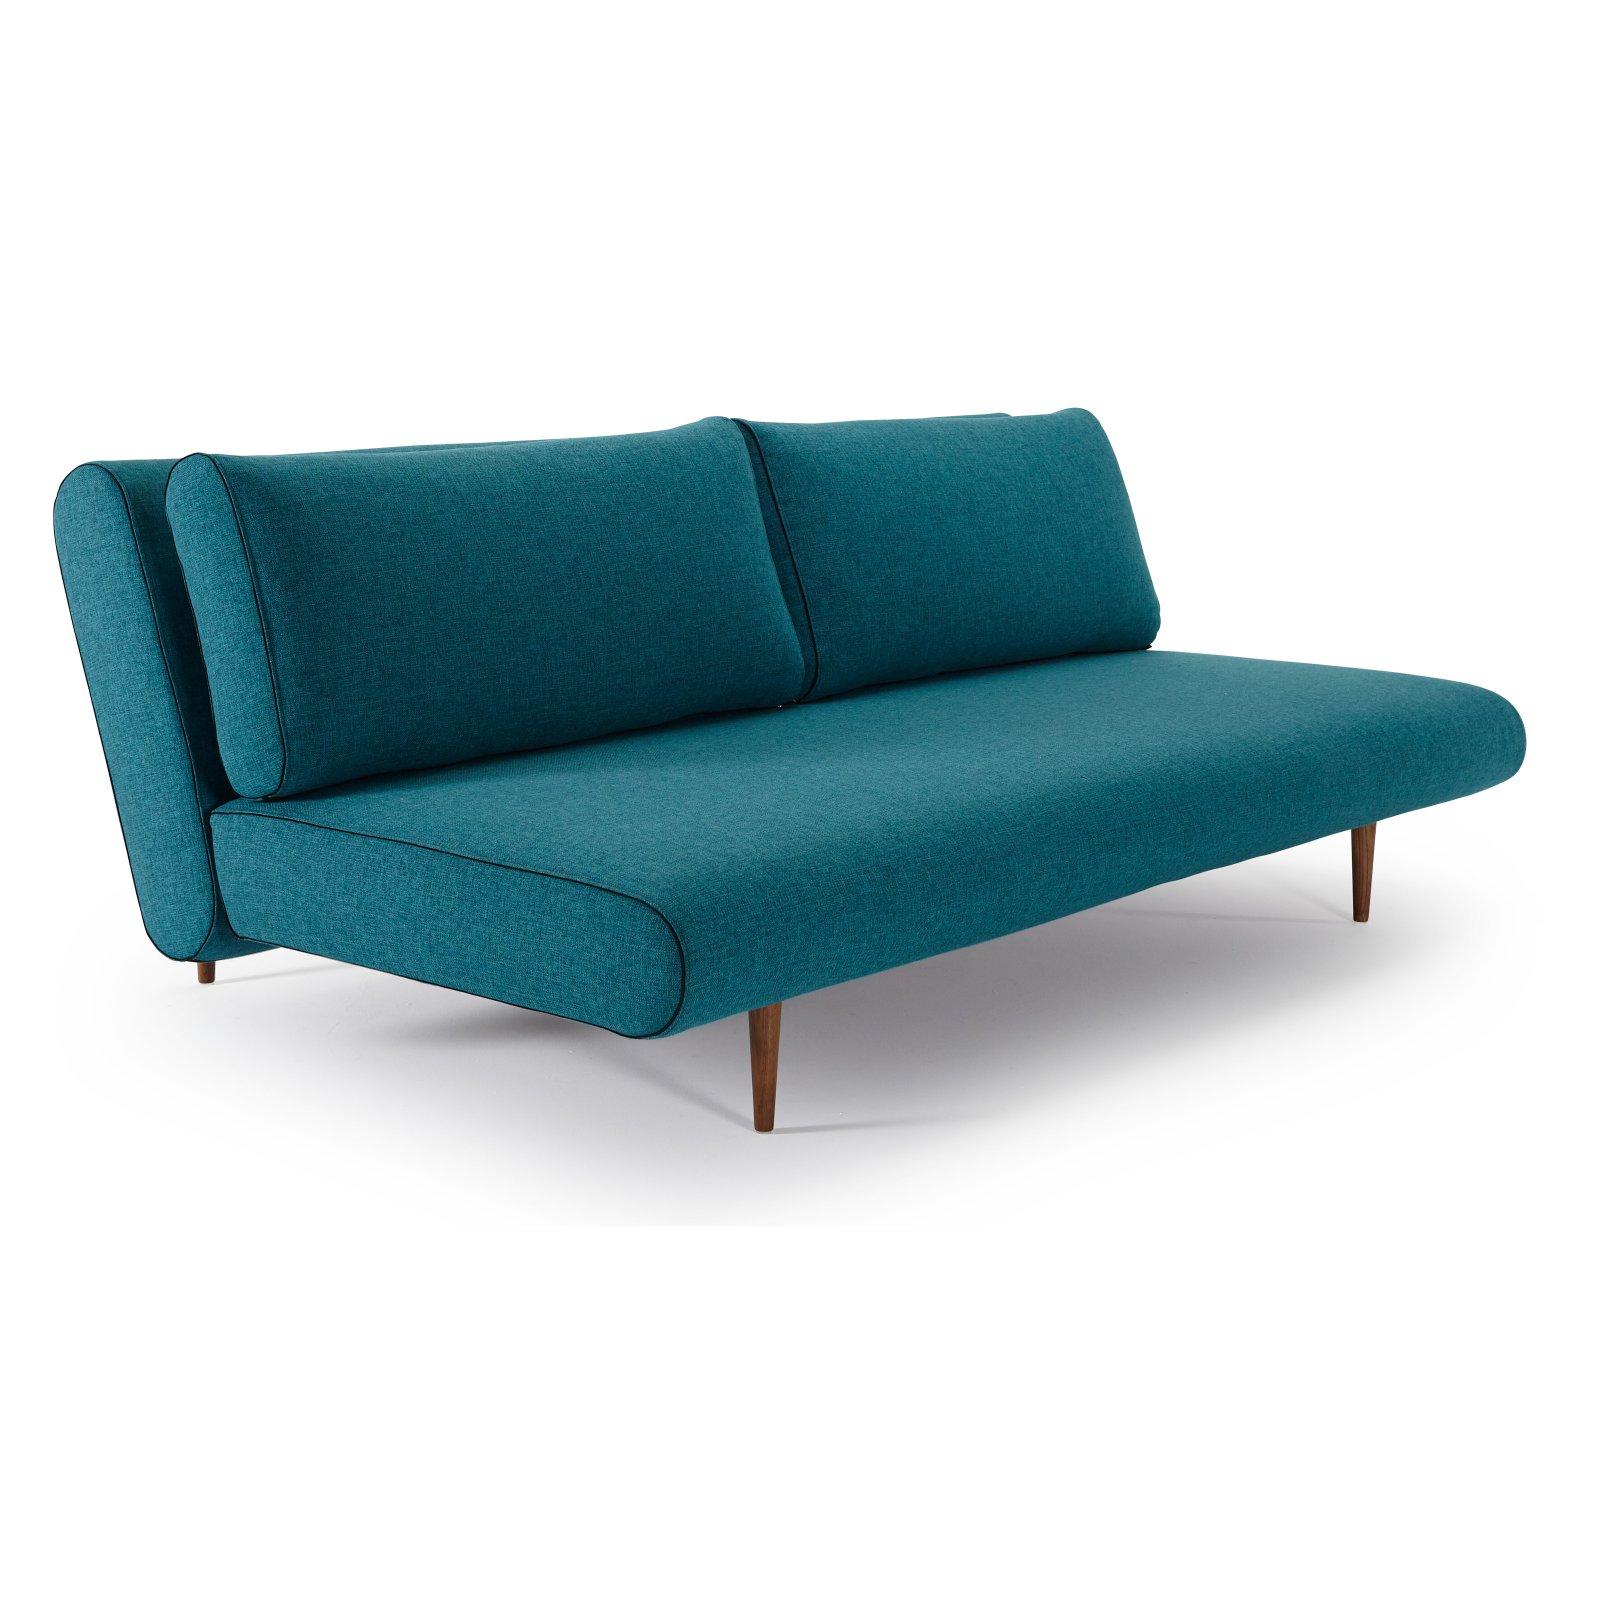 Innovation Living Unfurl Lounger Convertible Sofa Bed Mixed Dance